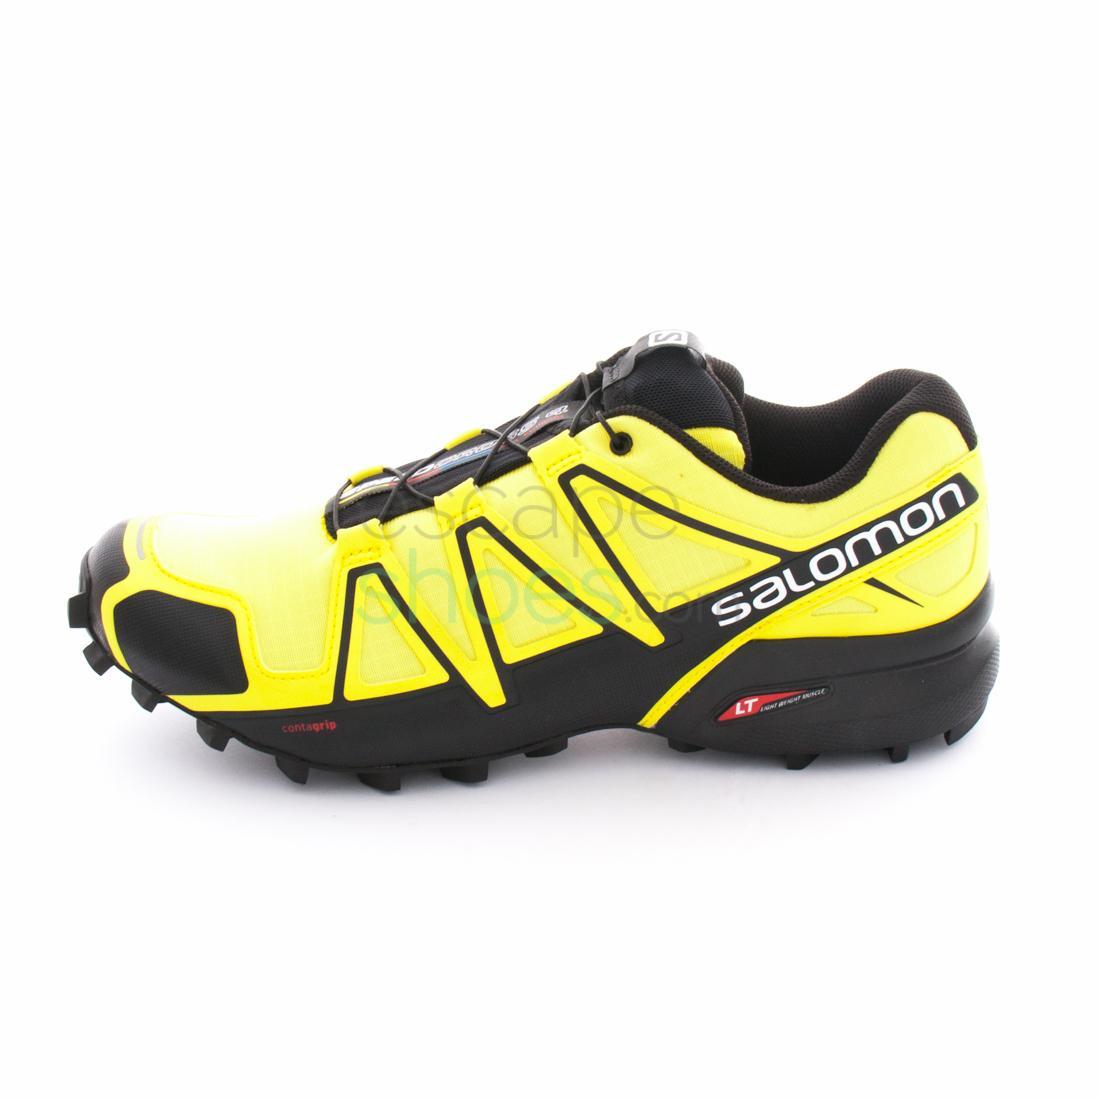 Zapatos SALOMON Speedcross 4 390616 Corona YellowCorona